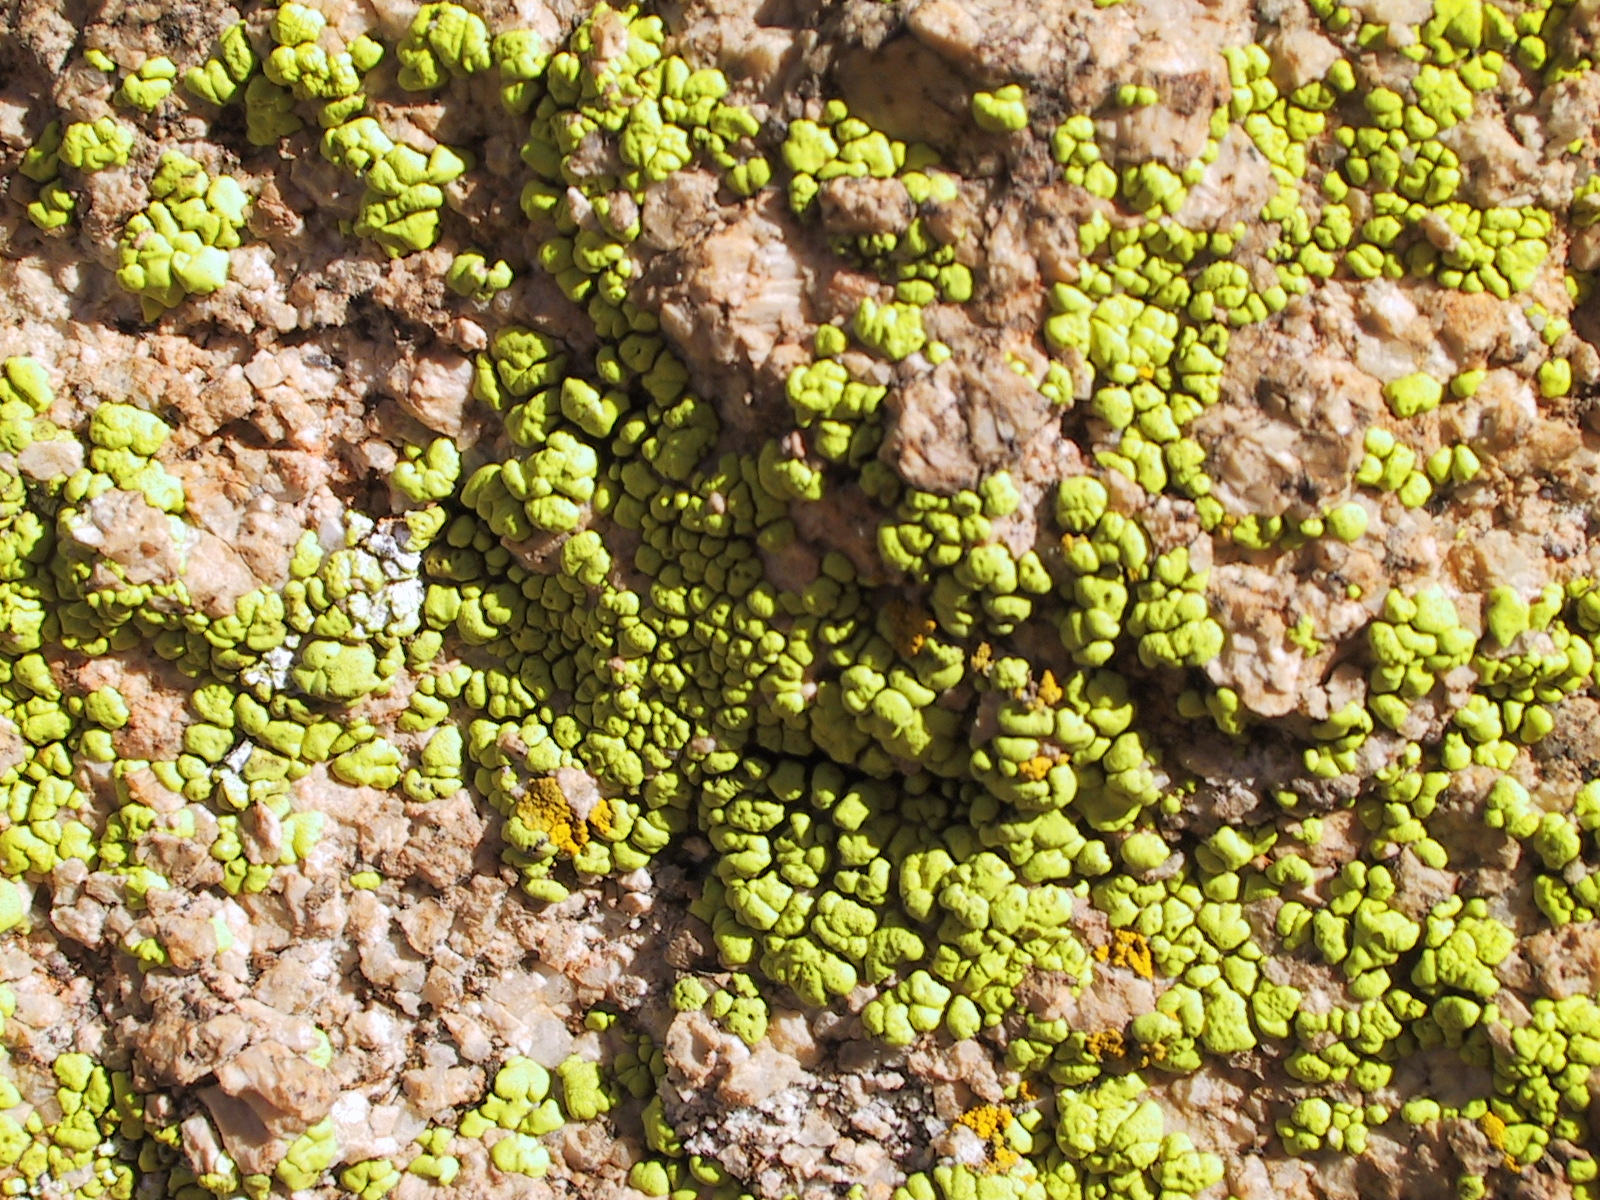 Strange Tiberium-like substance growing on the rocks.